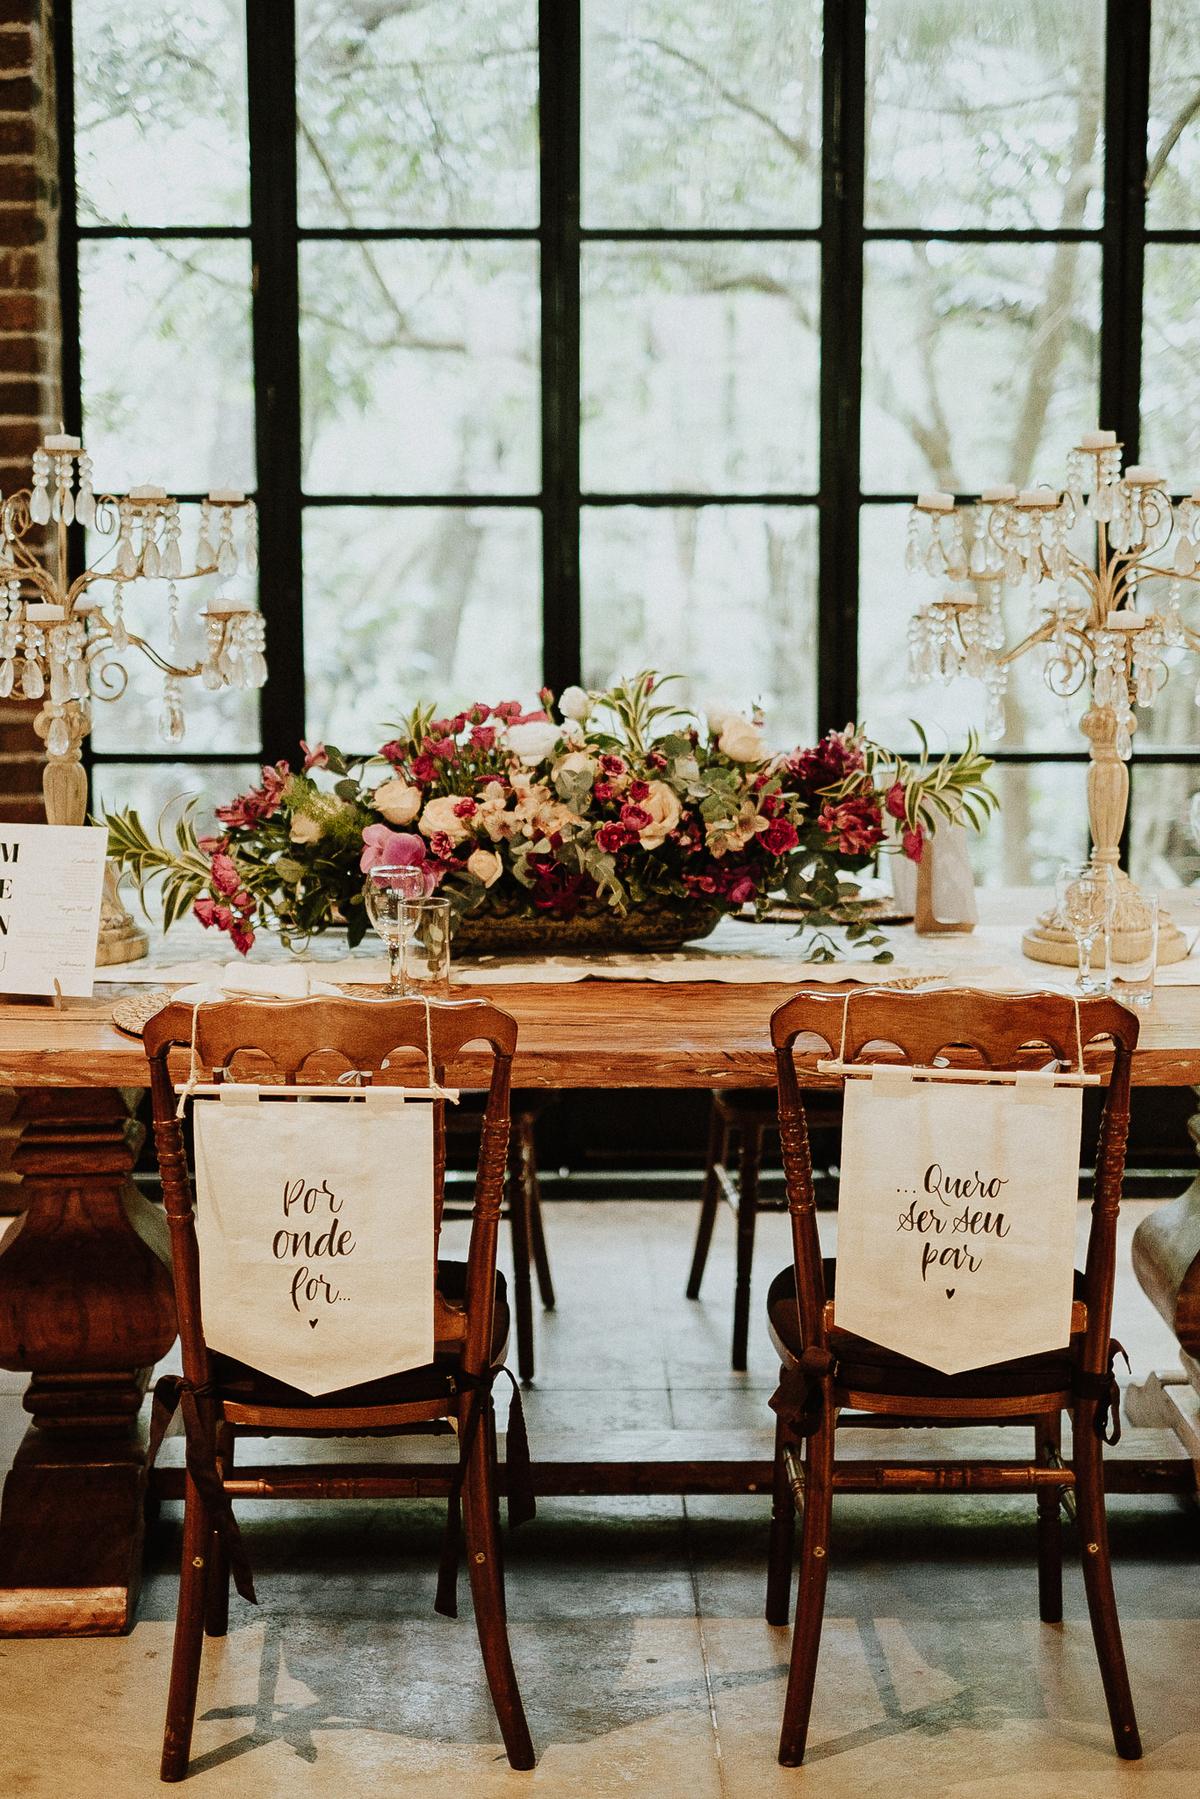 wedding day casamentos de dia casar no campo elopement wedding fotografia de casamento